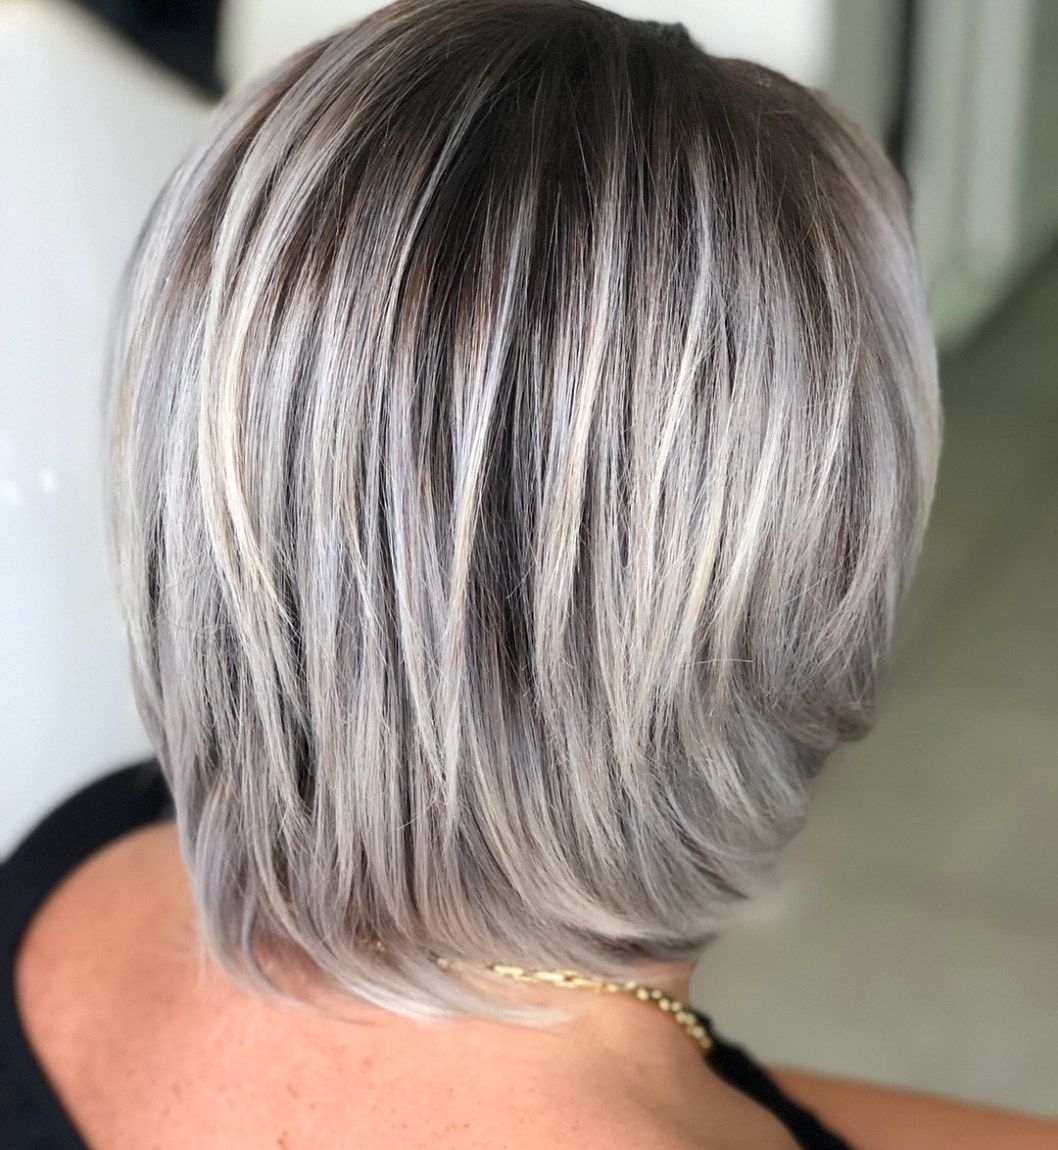 50 gray hair styles trending in 2020 hair adviser in